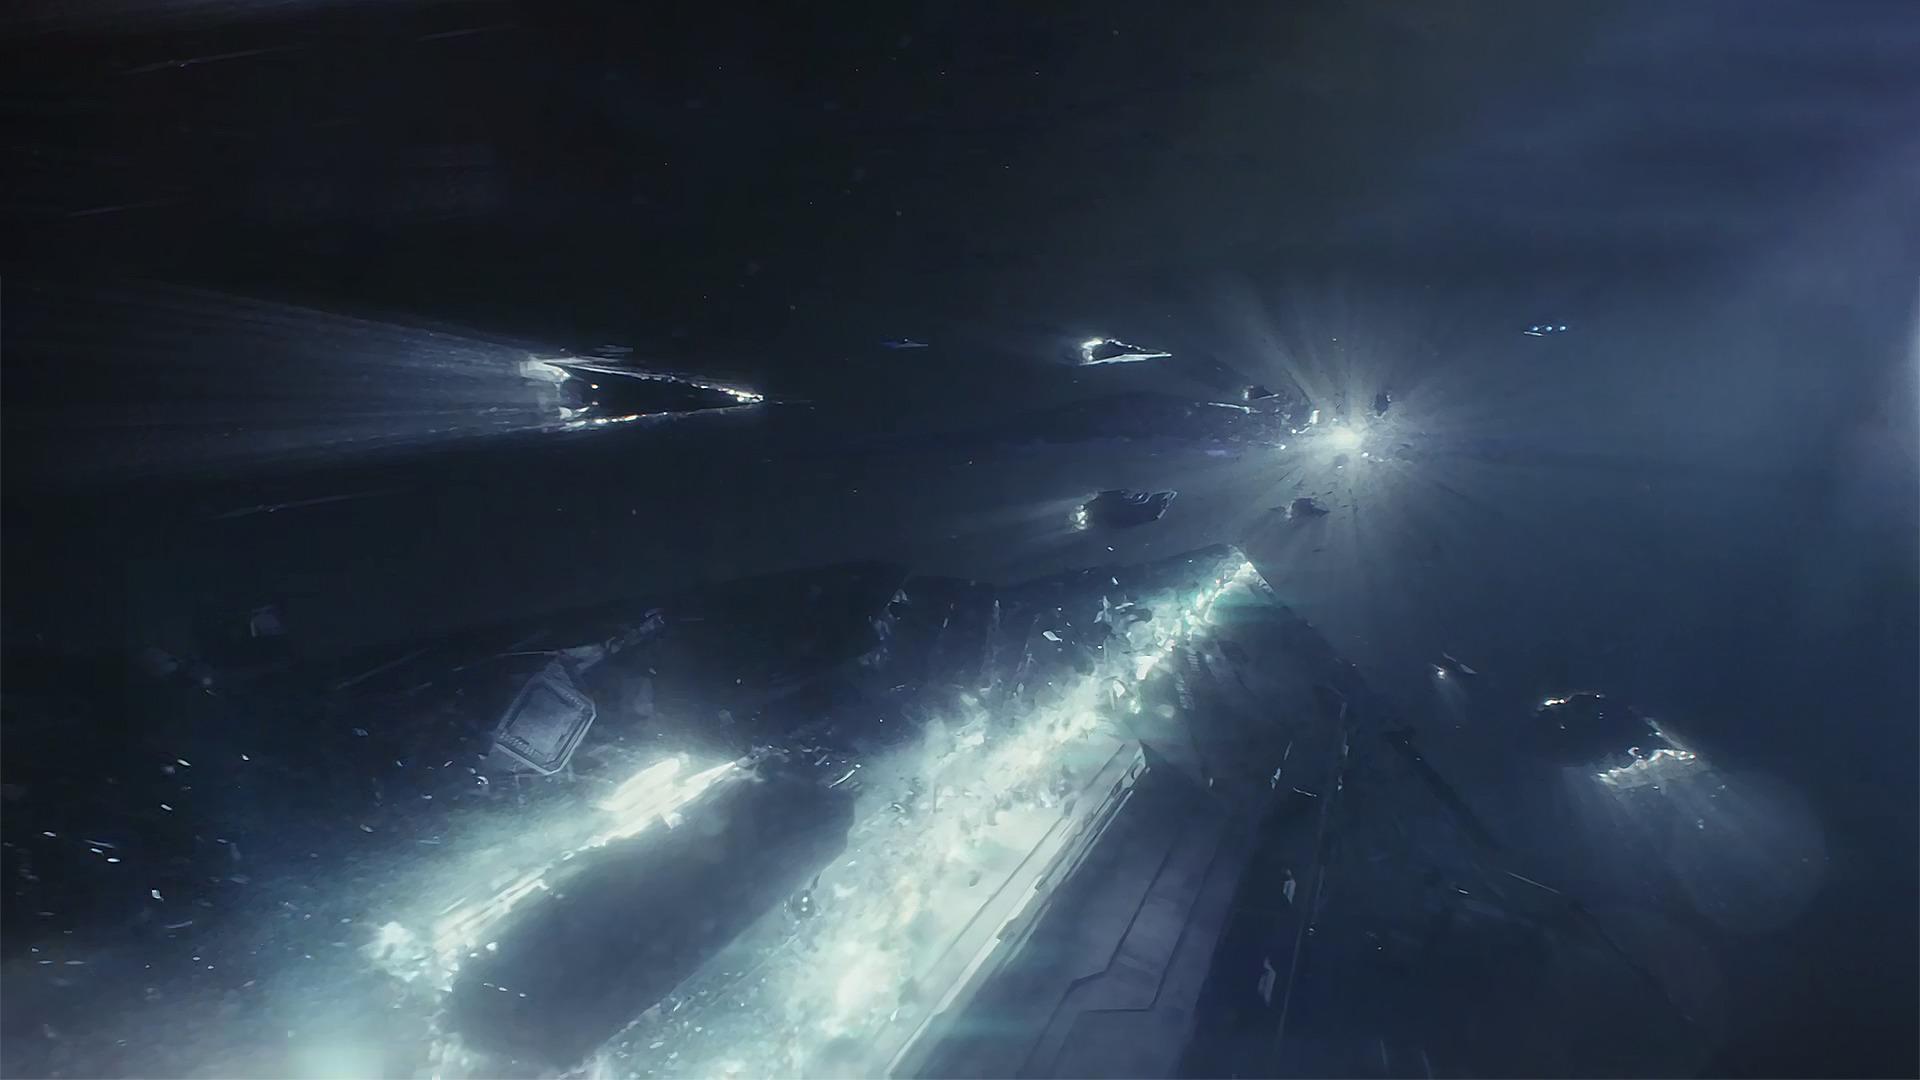 Star Wars The Last Jedi Lightspeed Crash 1920x1080 Wallpaper Teahub Io